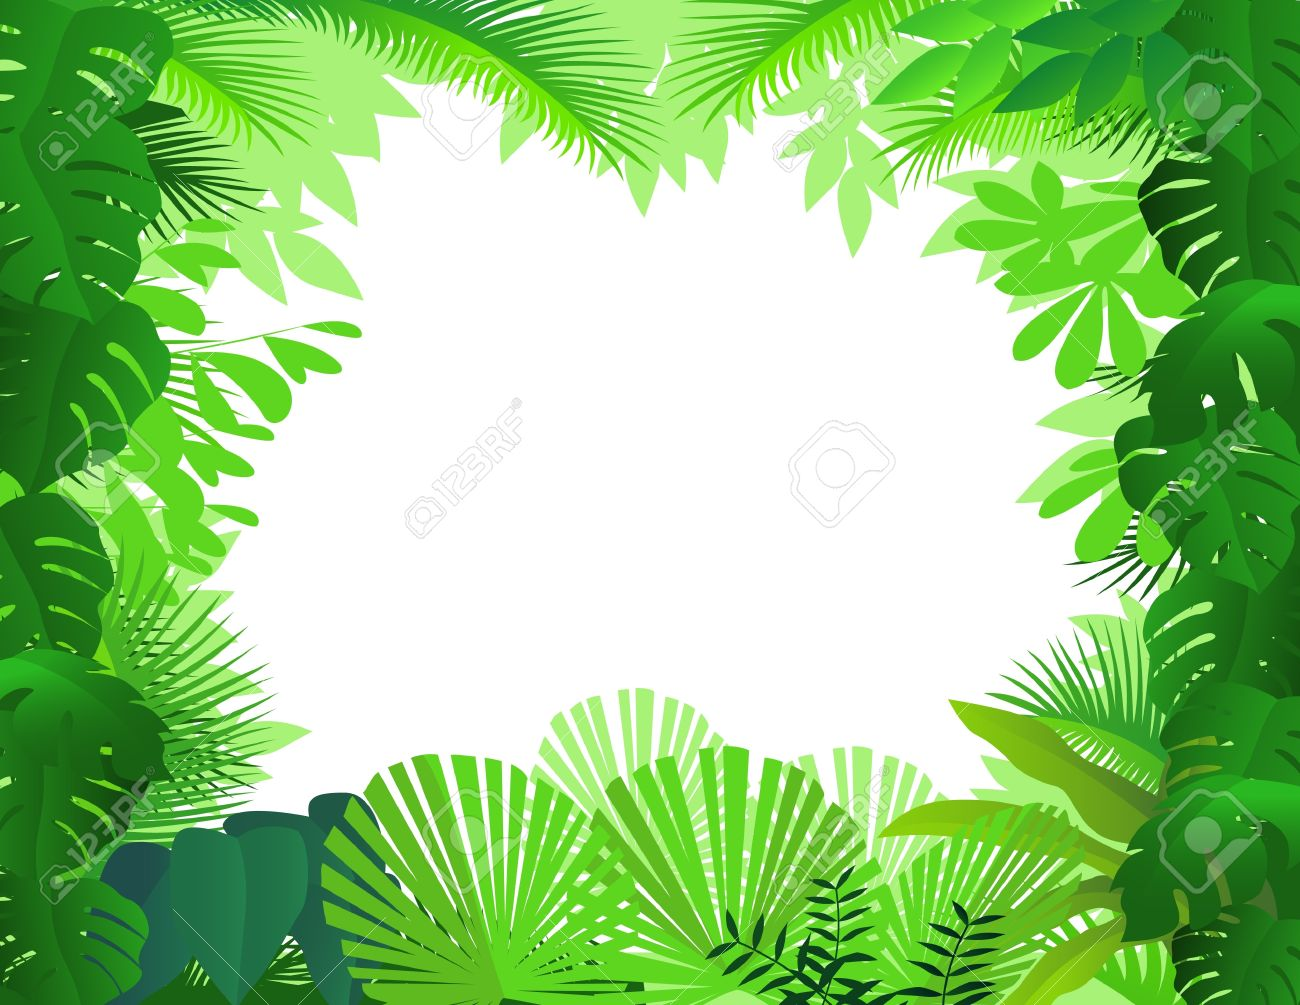 Tropical Rainforest Stock .-Tropical Rainforest Stock .-18